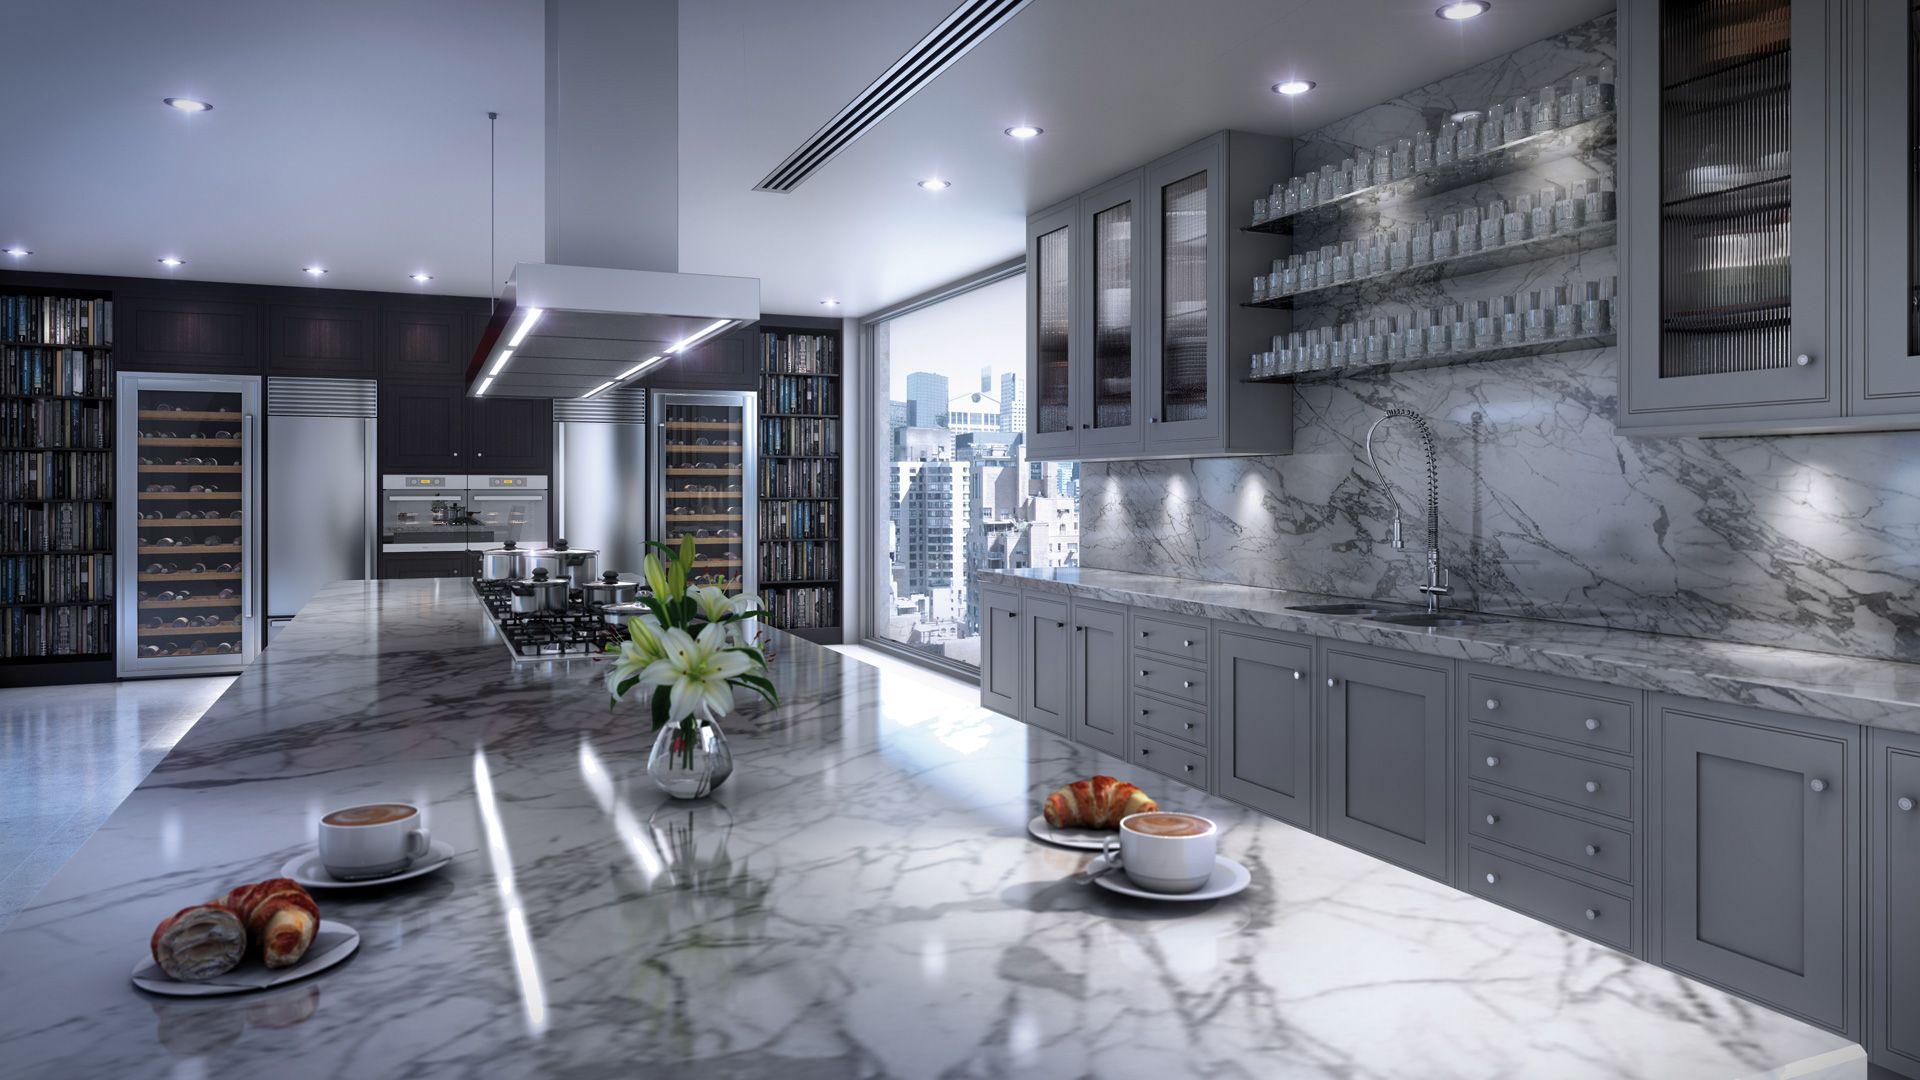 High Quality Alpha Deco Kitchen In Steel Grey With Black Walnut